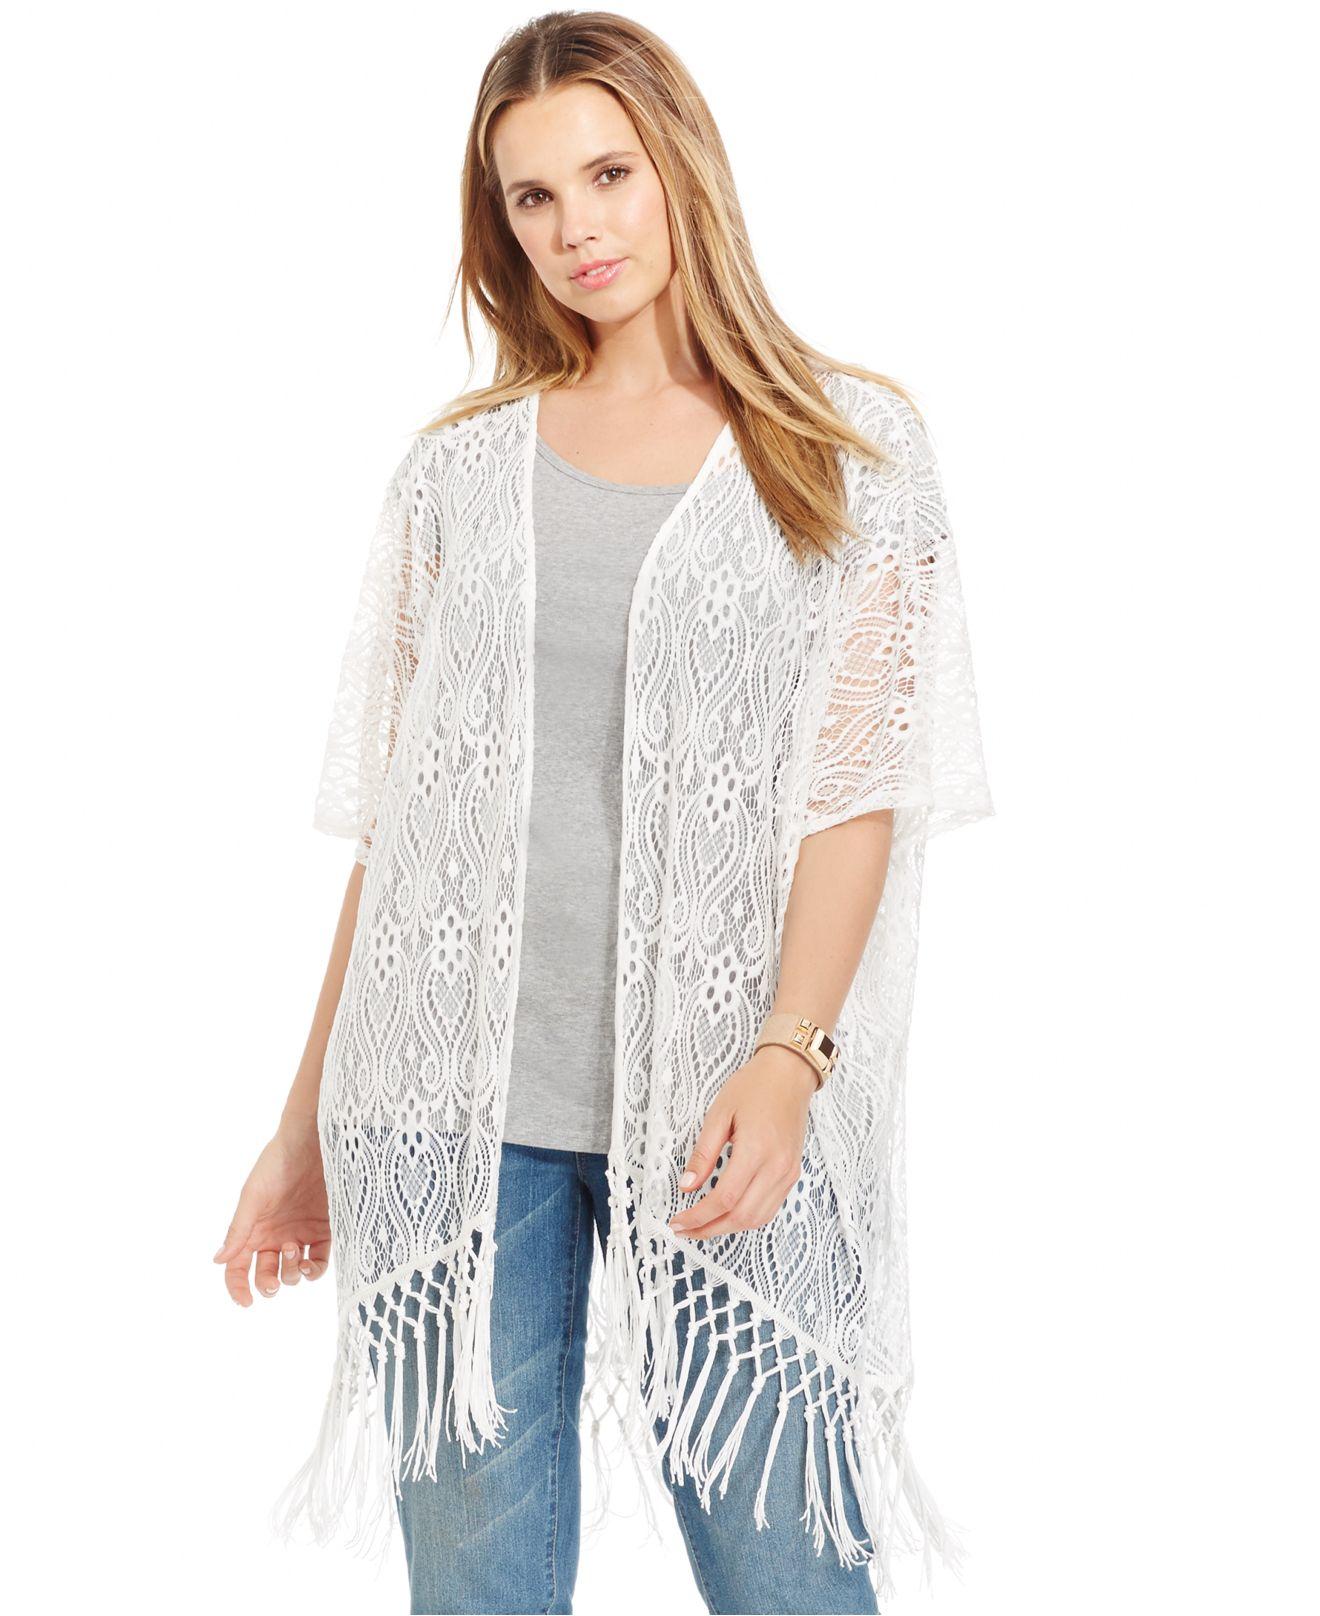 Soprano Plus Size Fringed Lace Kimono Cardigan in White | Lyst